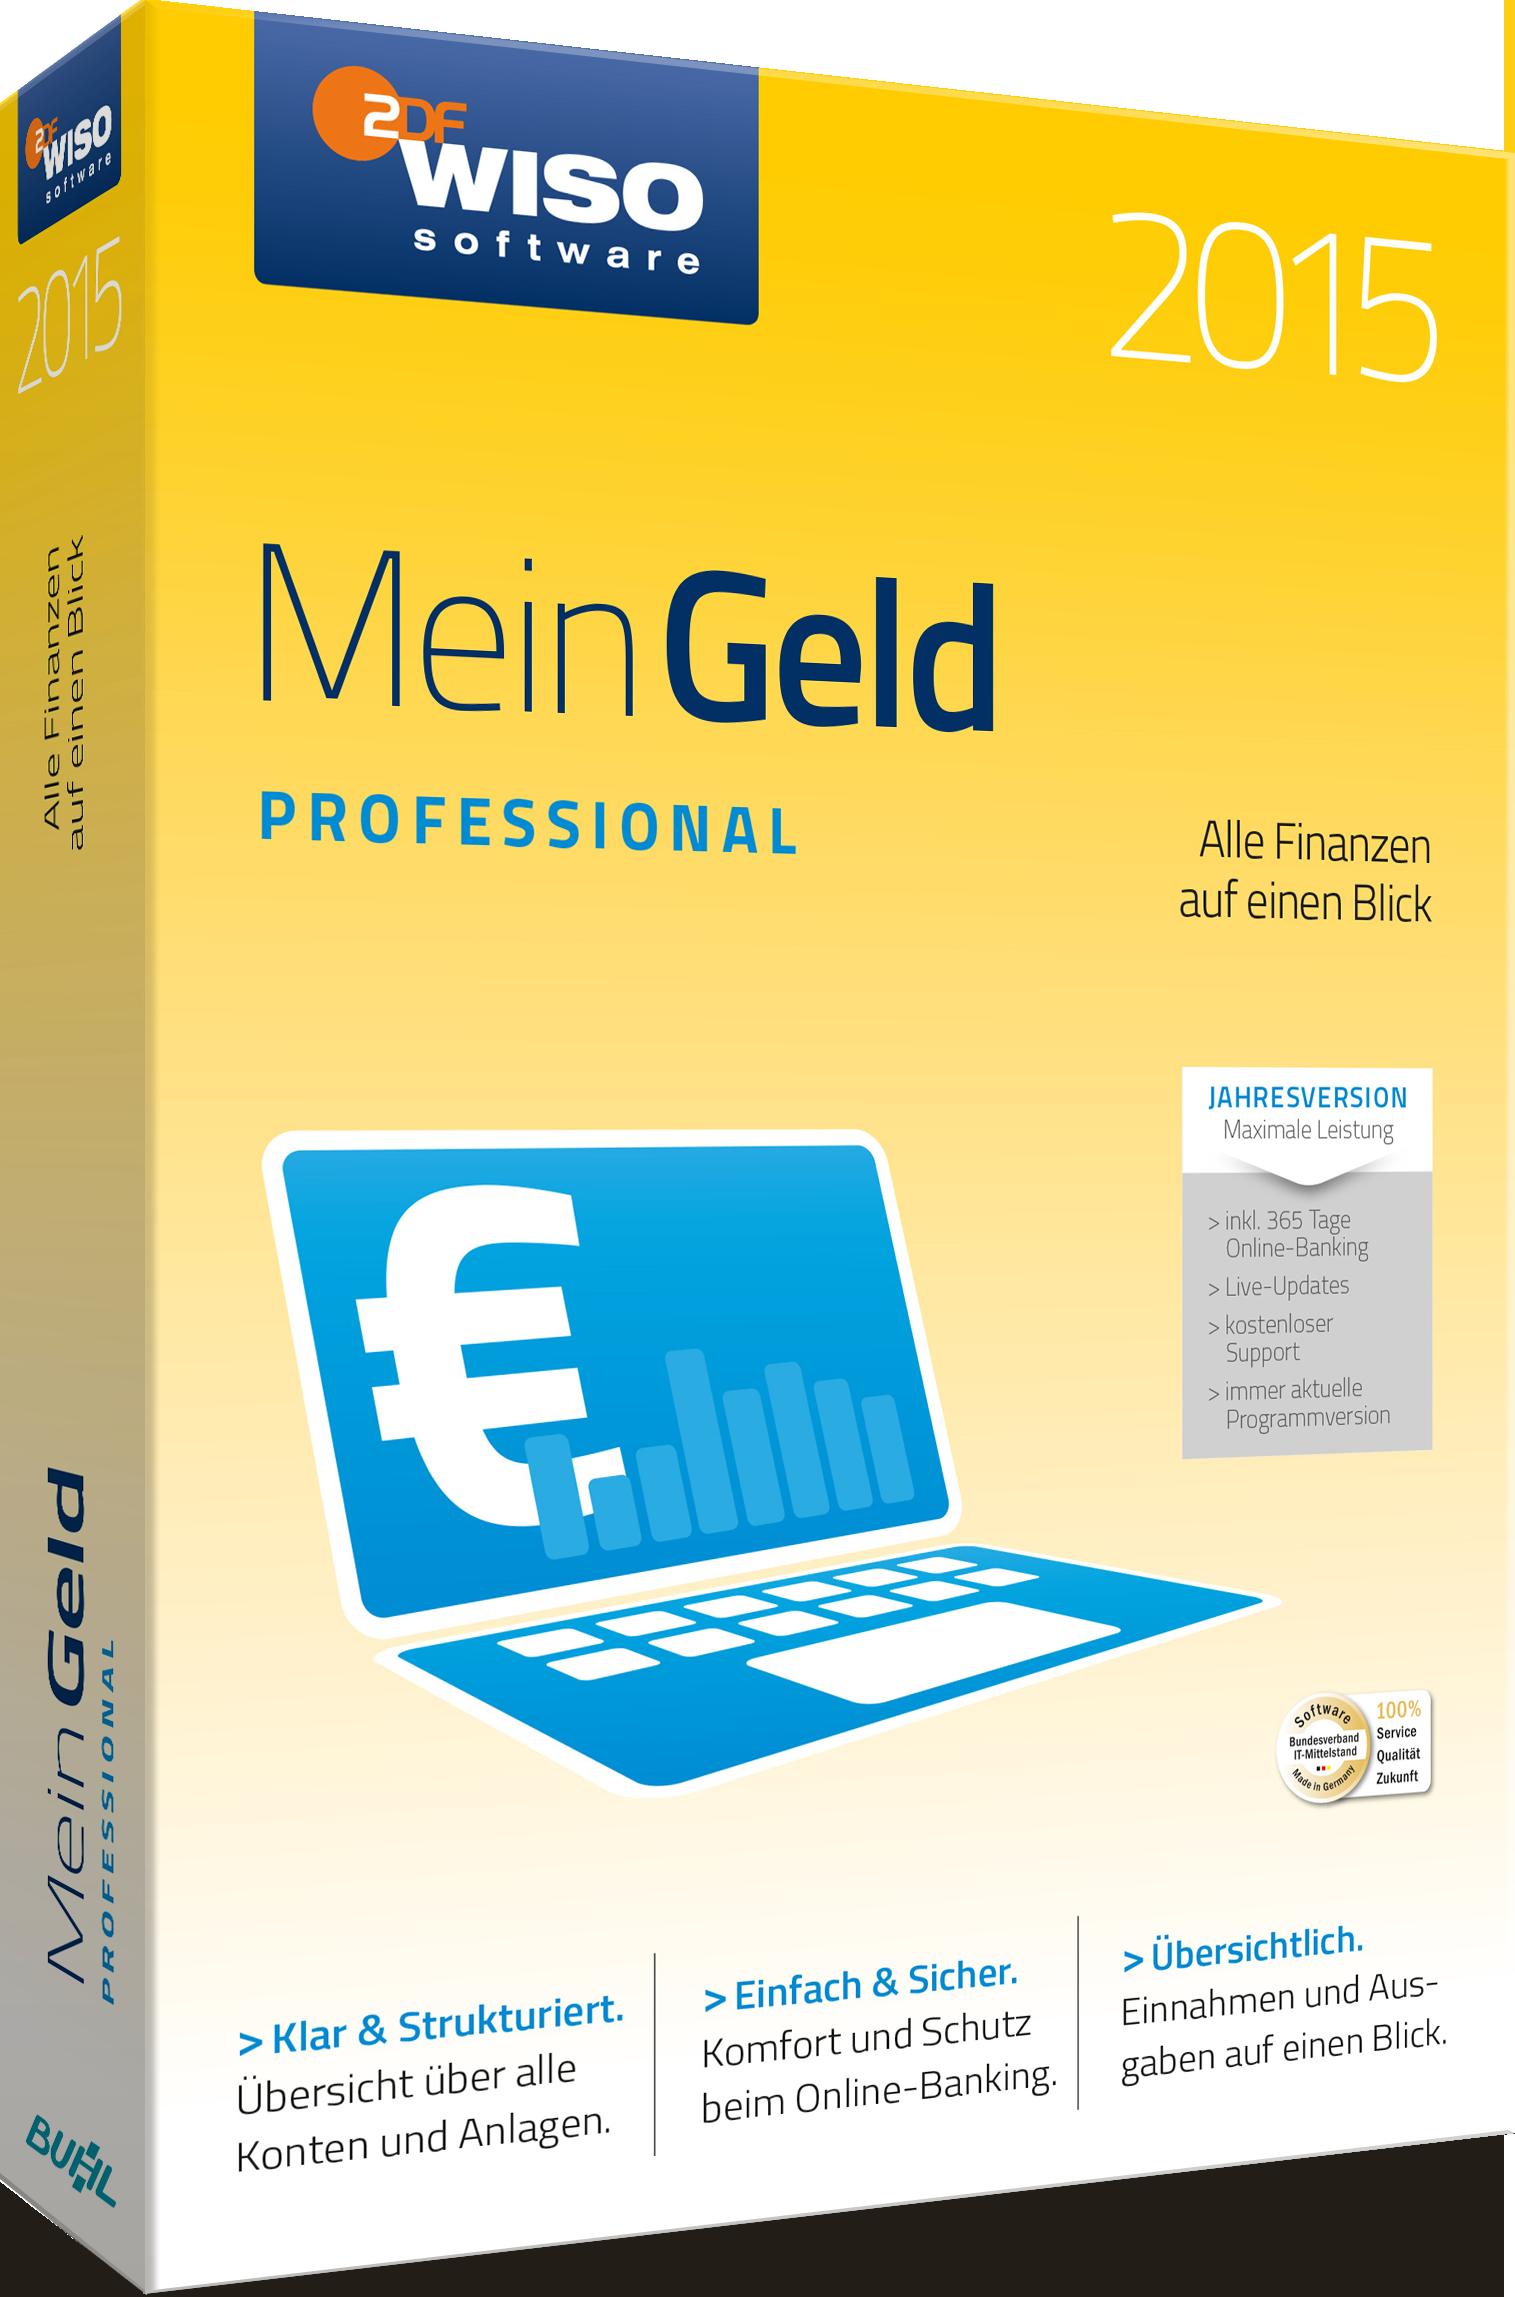 WISO Mein Geld 2015 Professional 365 Tage Version